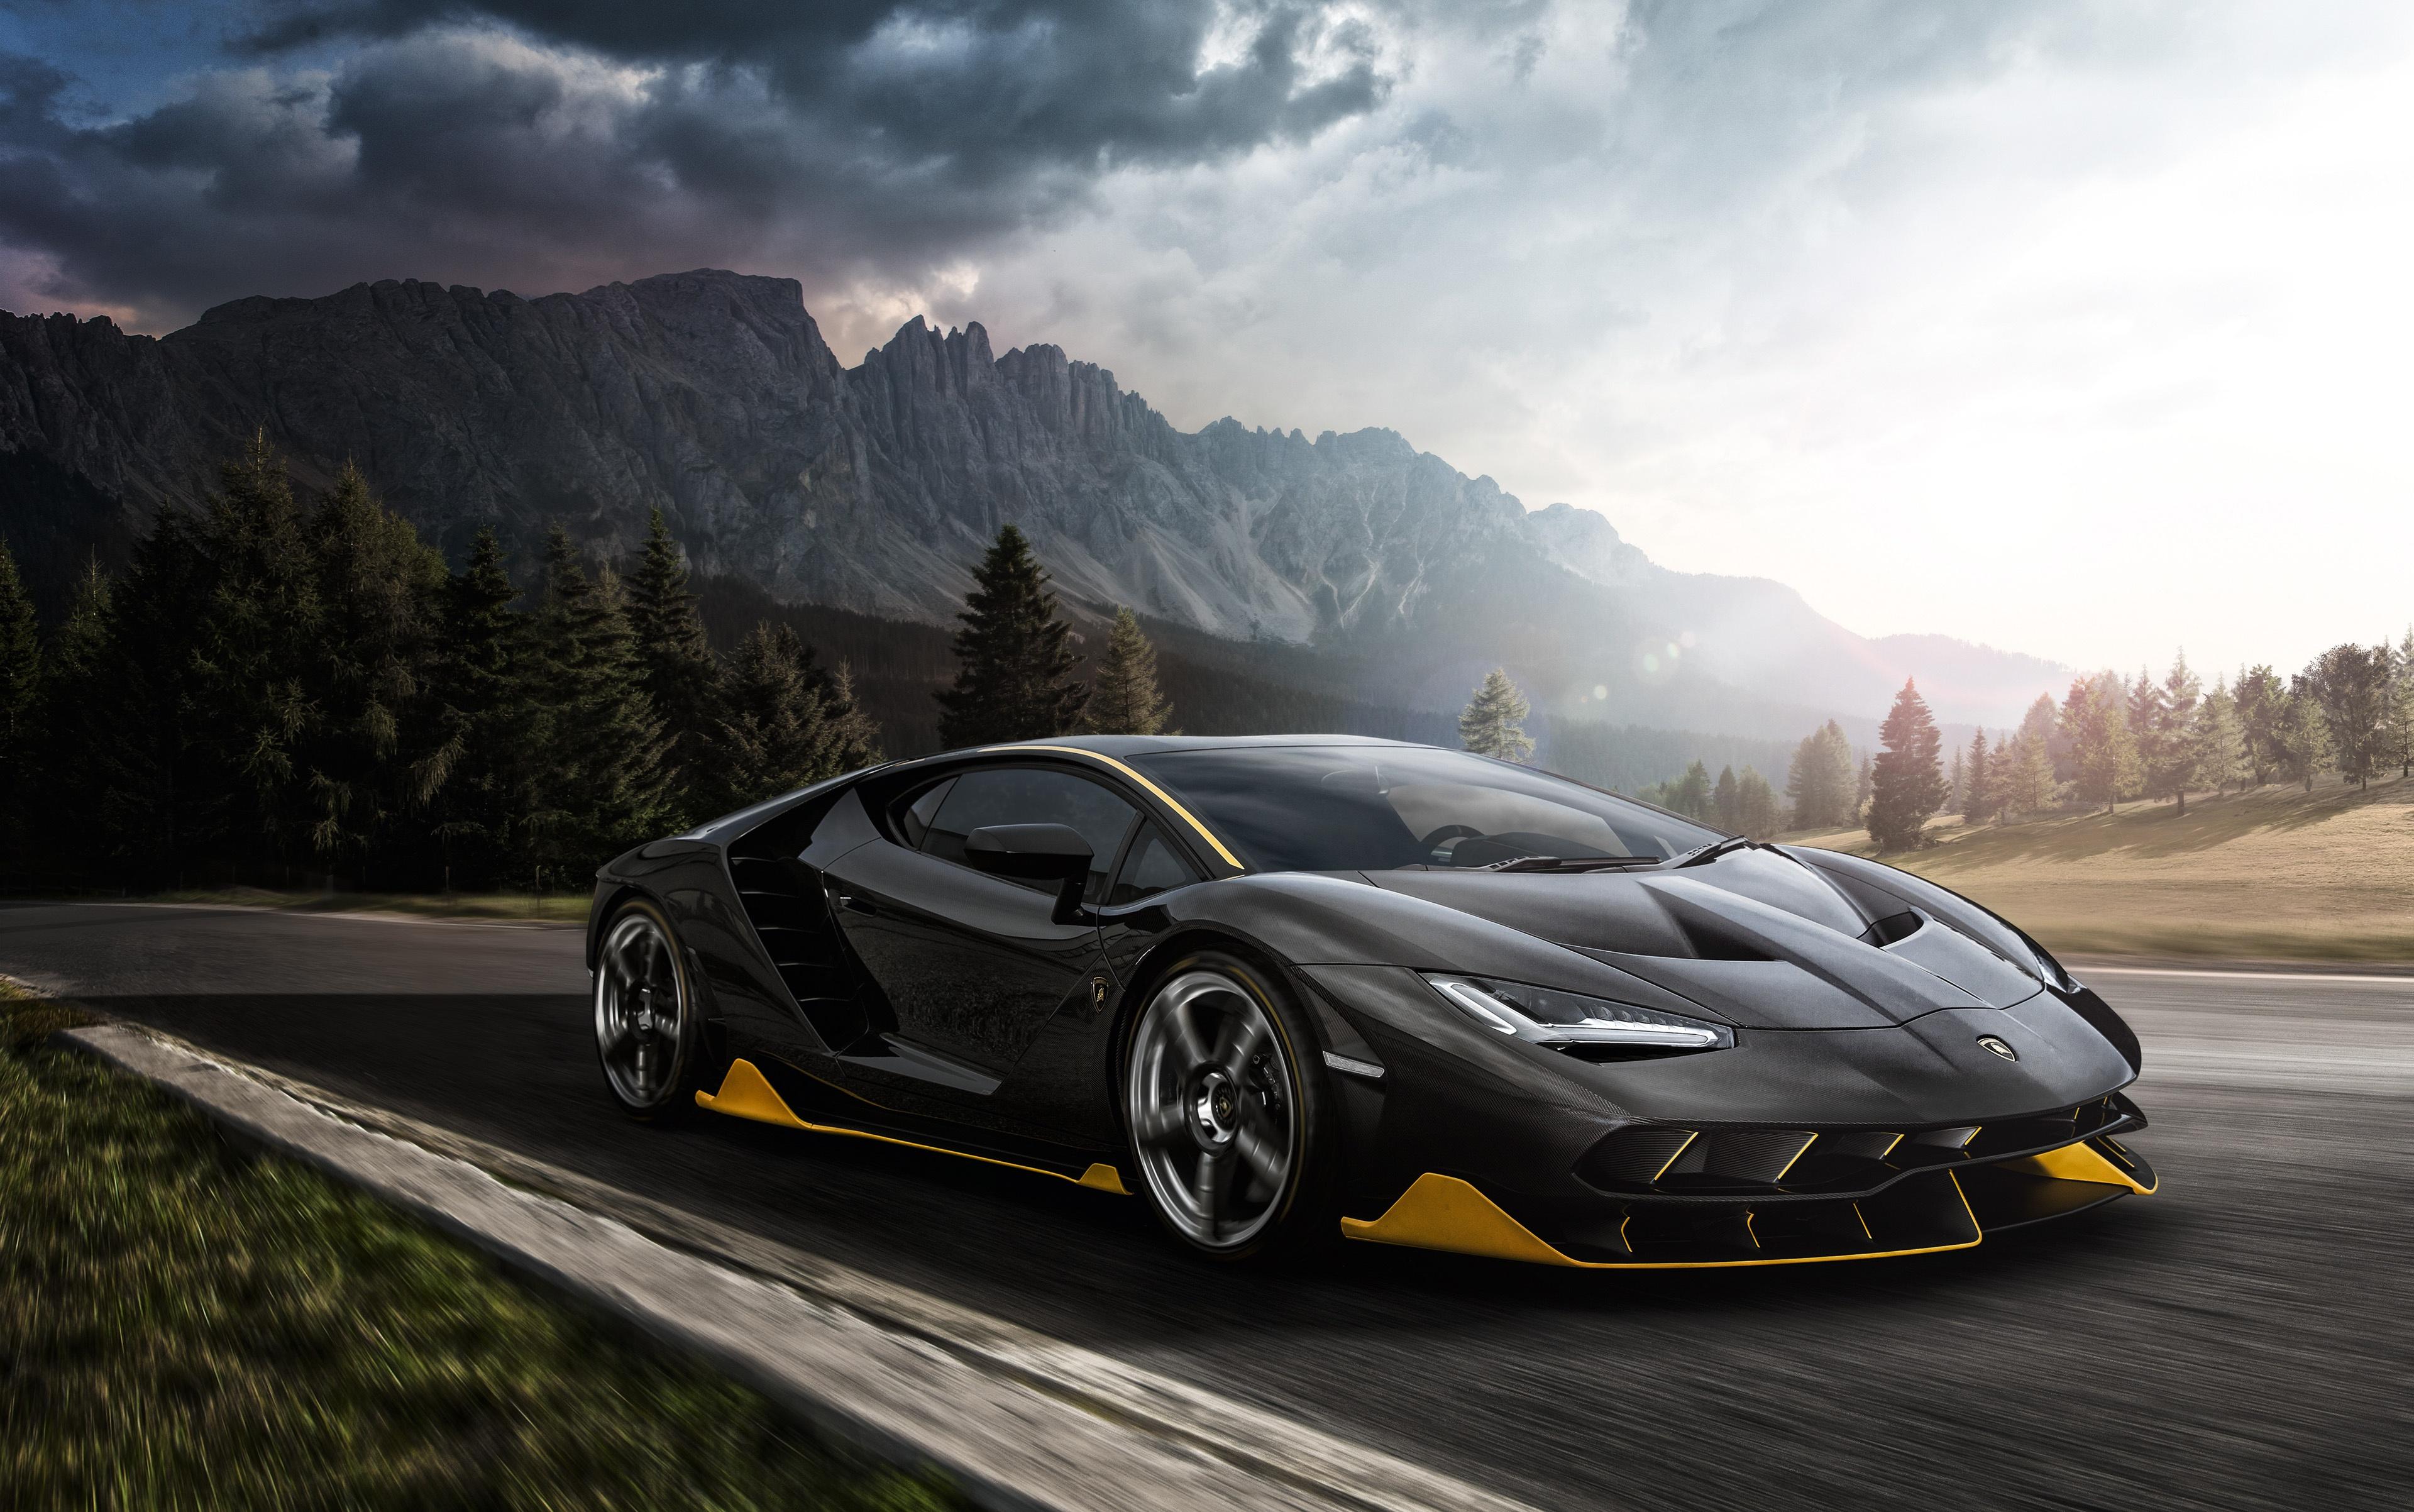 Lamborghini Centenario 4k Ultra Hd Wallpaper Background Image